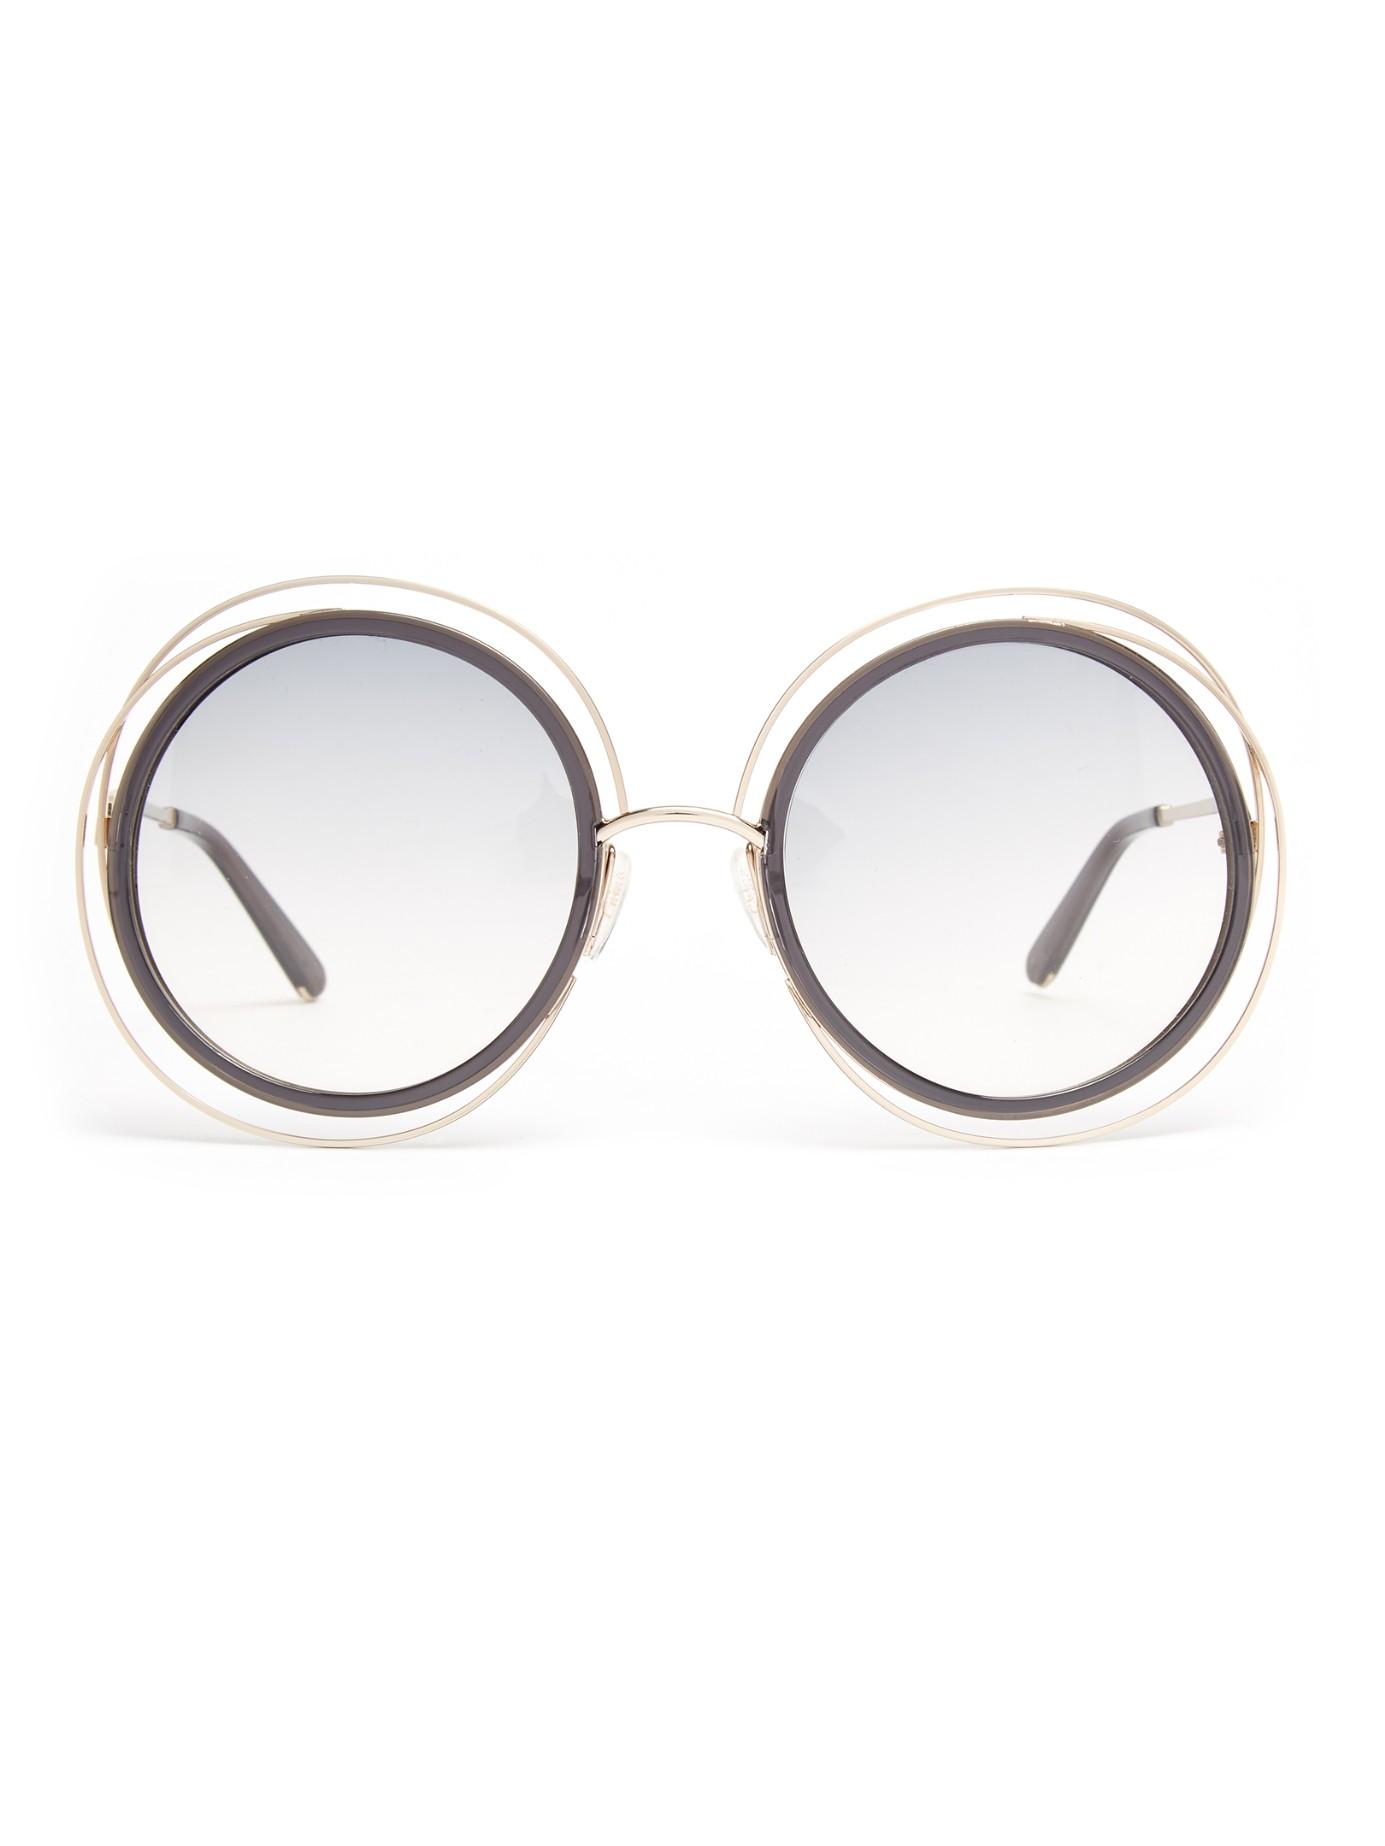 159866f8e94 Chloé Carlina Round-framed Sunglasses in Metallic - Lyst